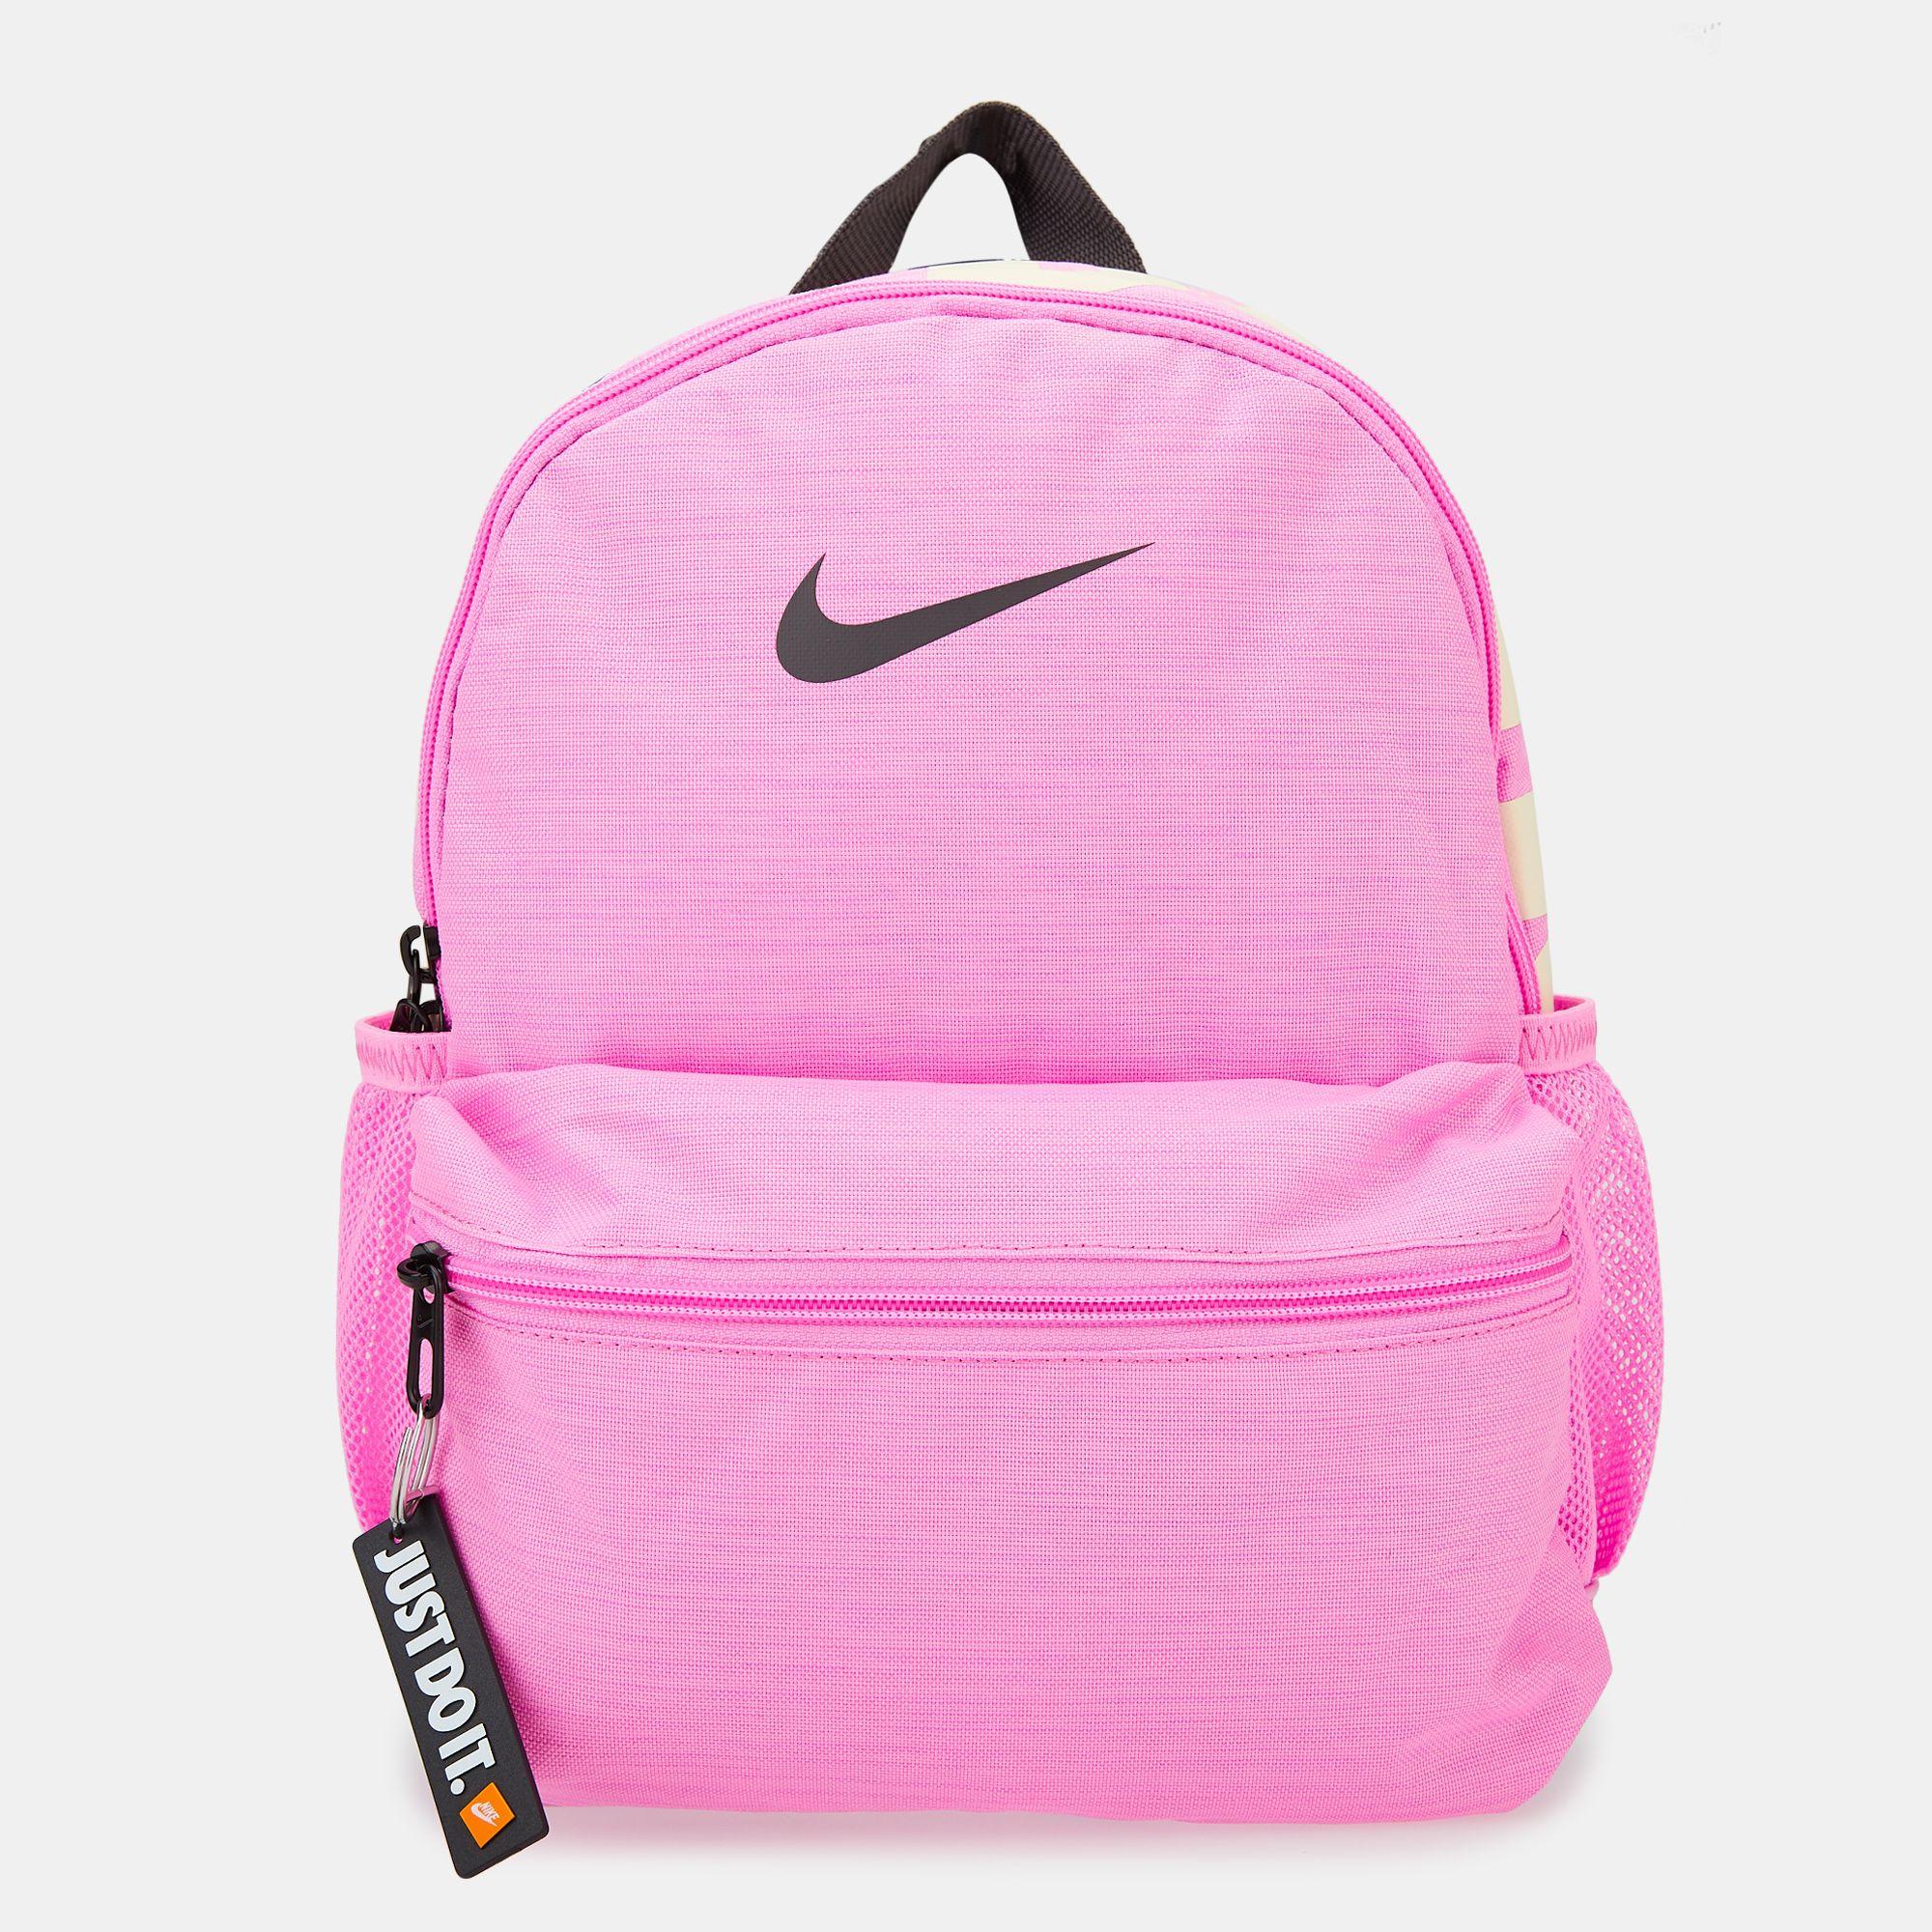 a1e6300b2b09e Nike Kids  Brasilia Just Do It Mini Backpack (Older Kids) - Pink